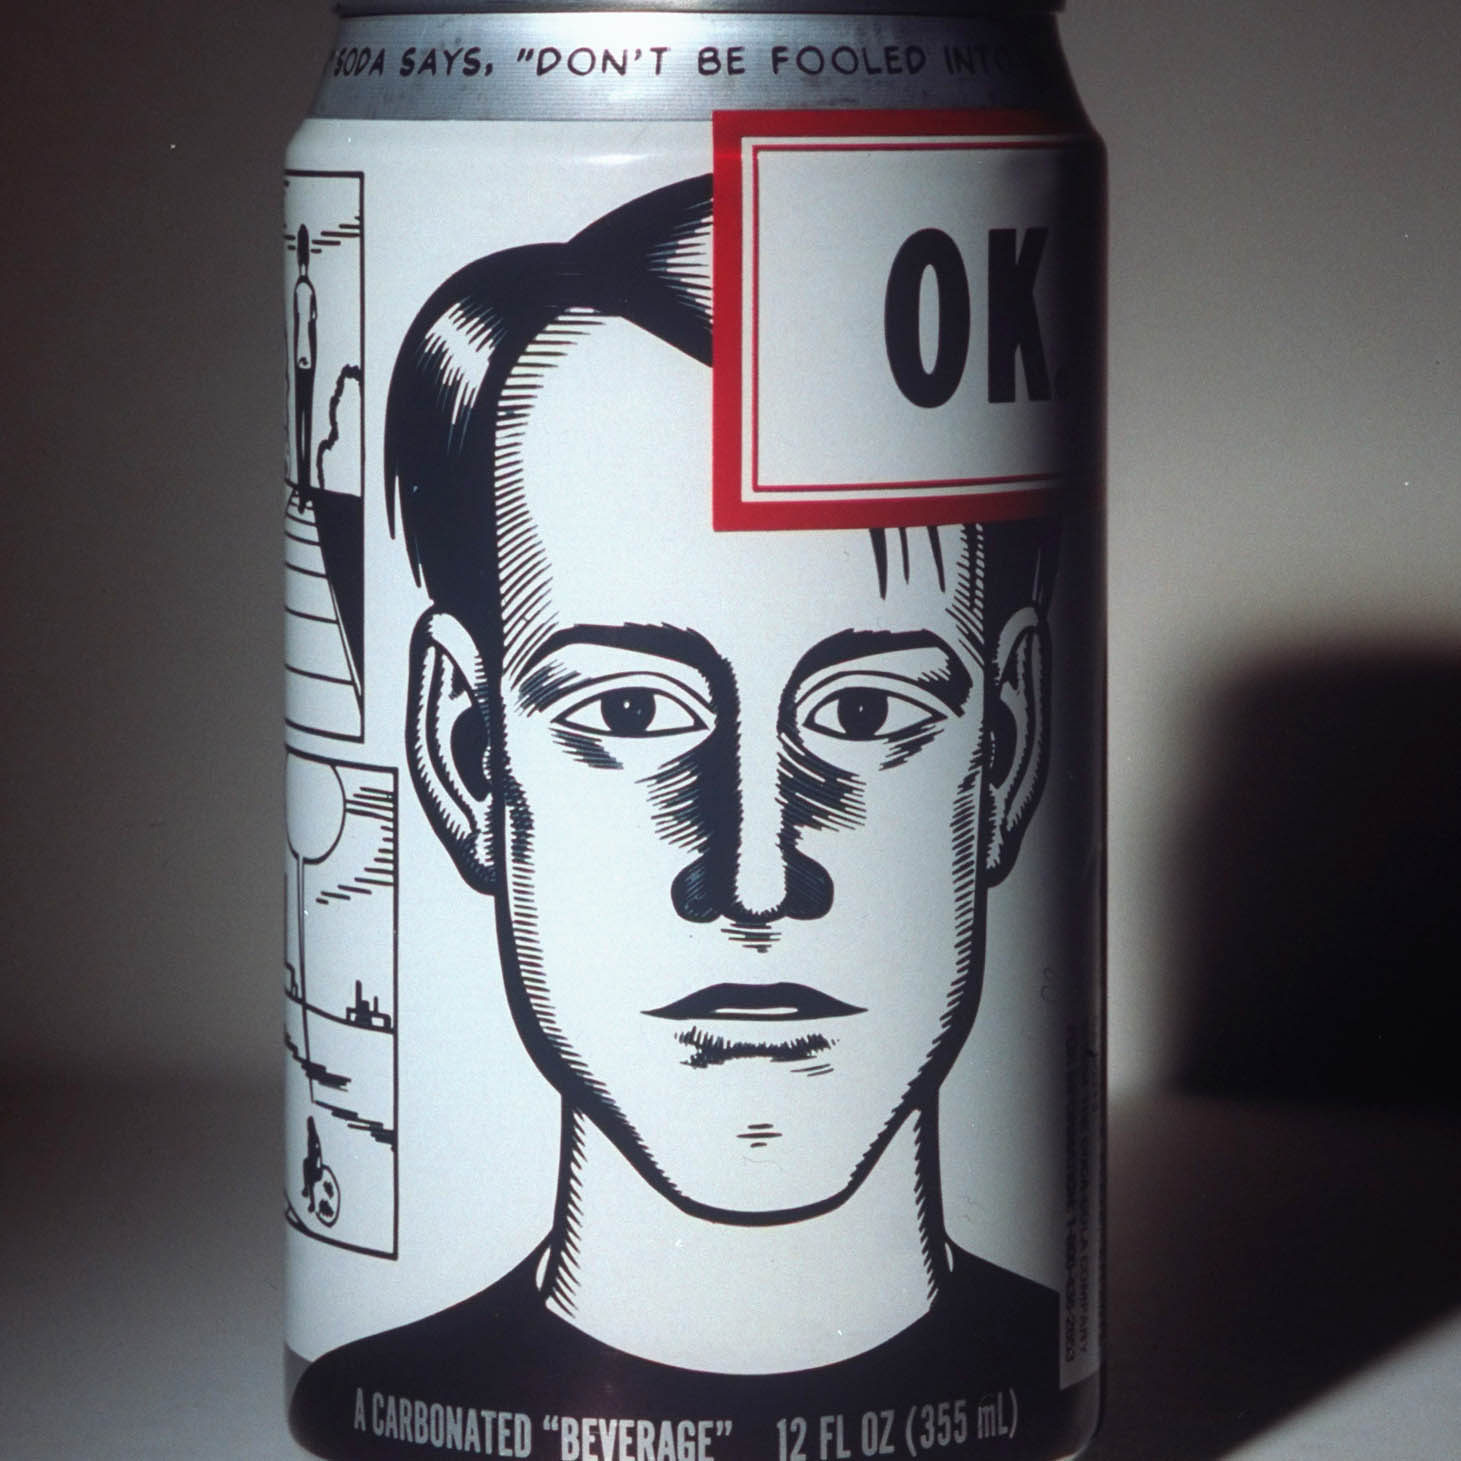 Coca-Cola's new OK soda, being test mark